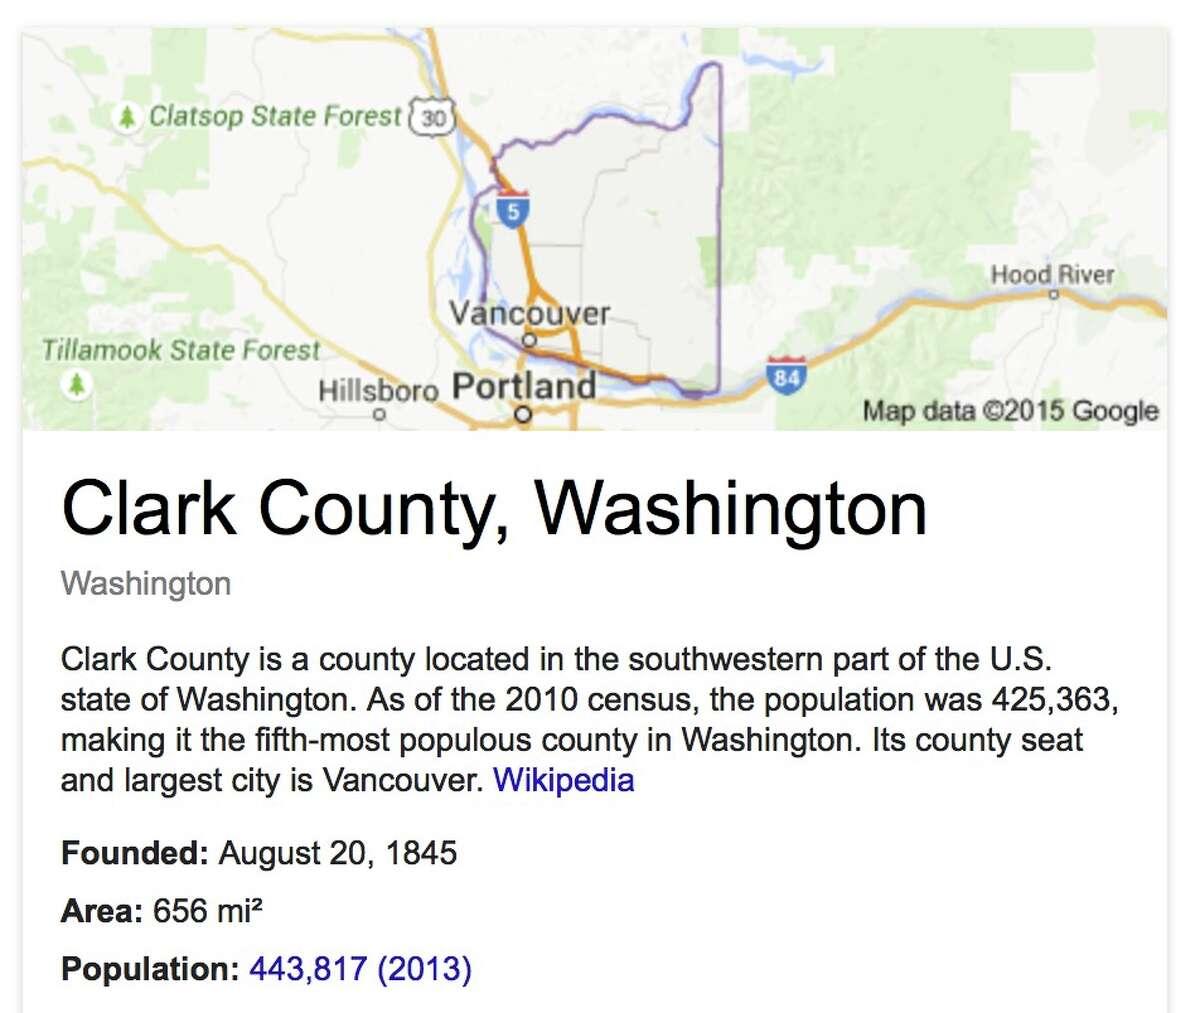 Clark: Total sales: $24,625,881 - Per capita sales: $56.93 - Average sales among retailers: $3,517,983 - Number of retailers: 7